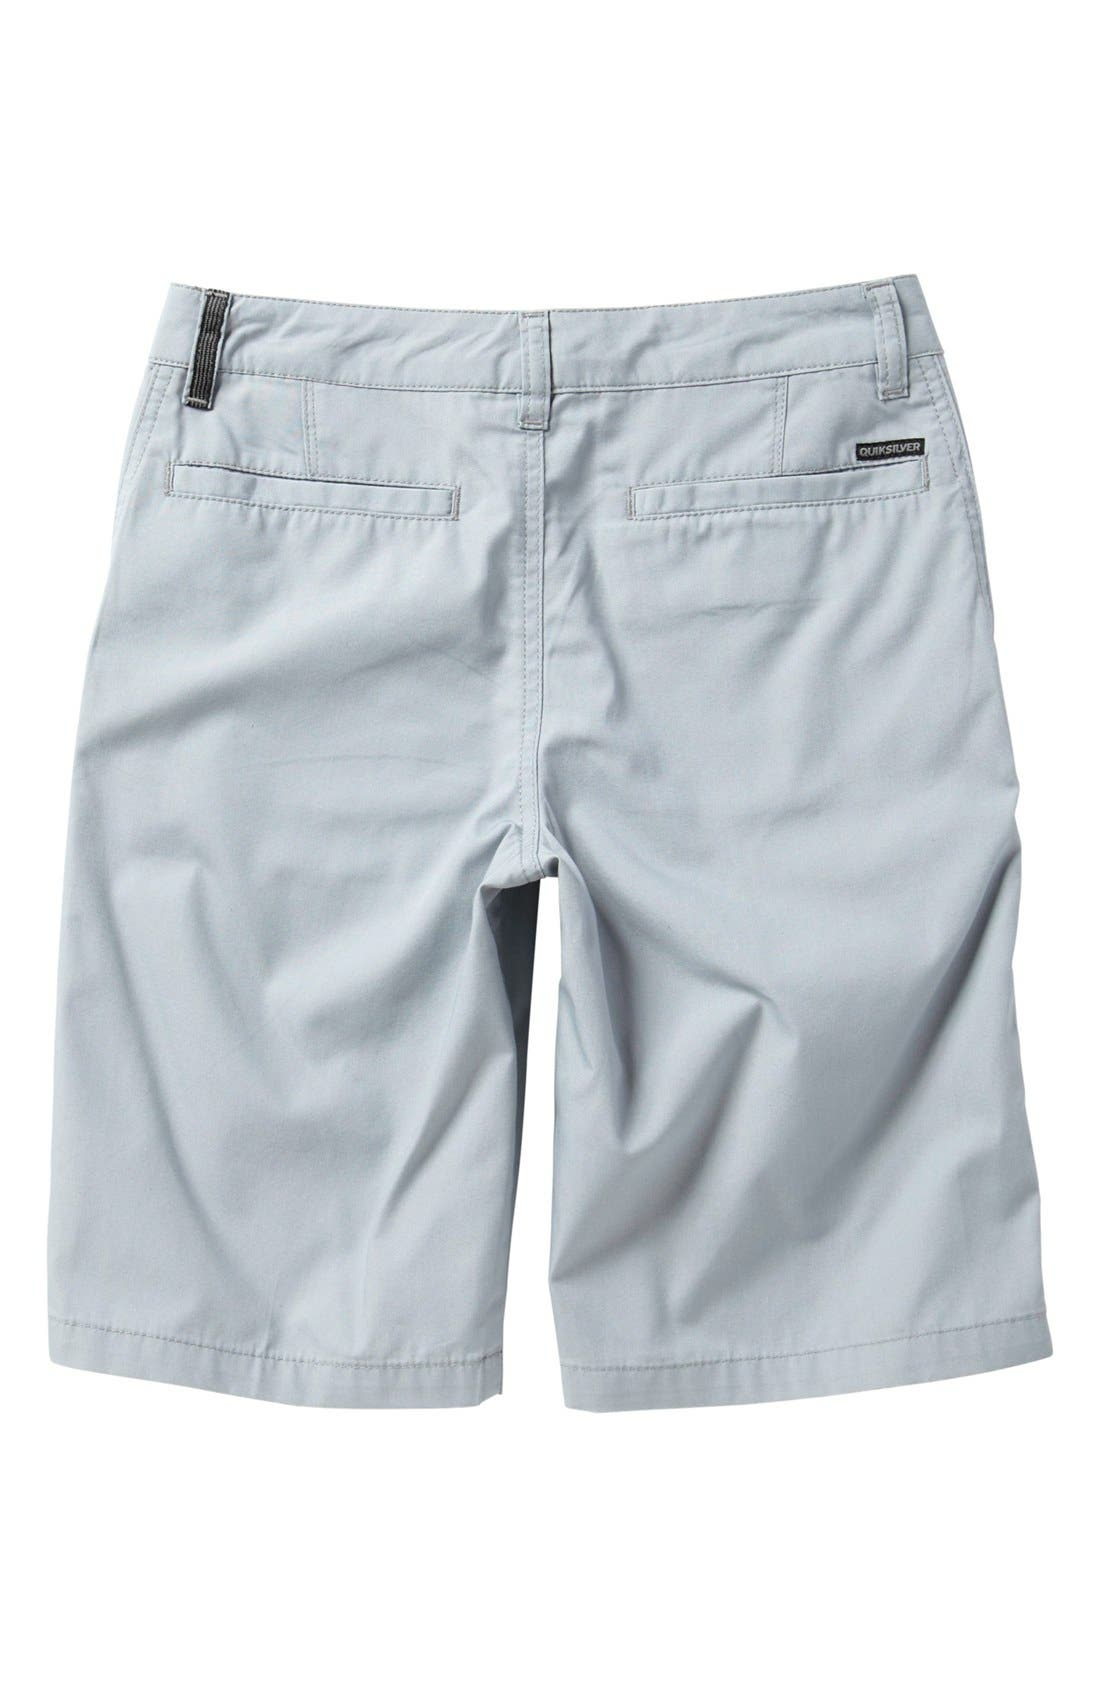 Alternate Image 2  - Quiksilver 'Rockefeller' Shorts (Big Boys)